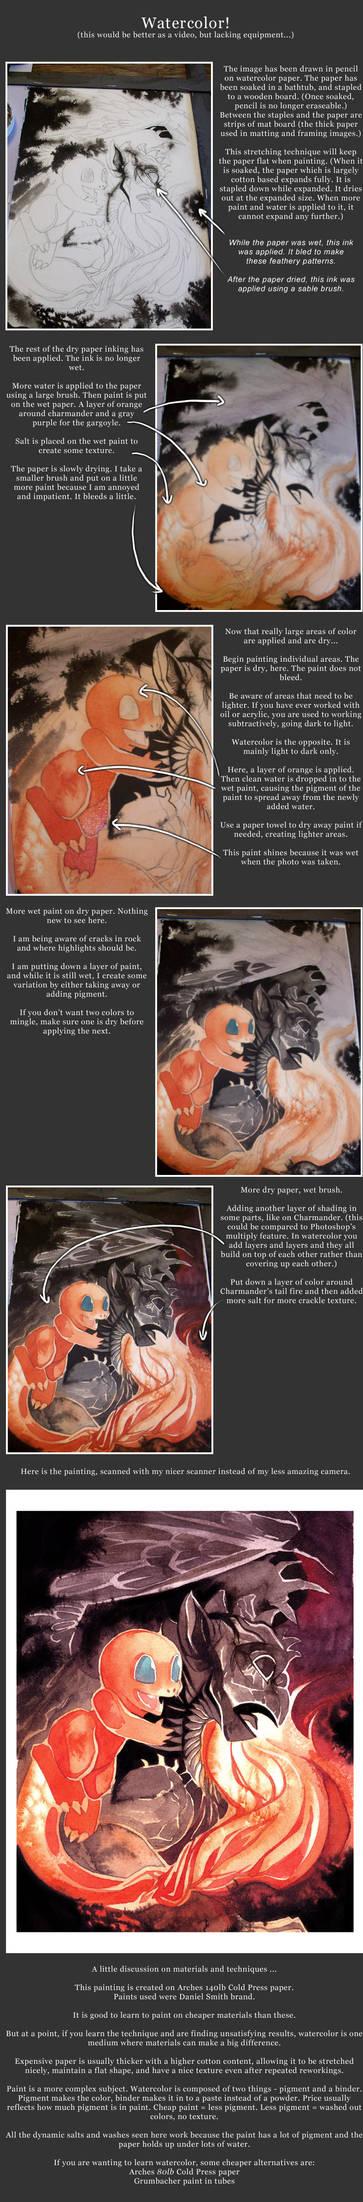 Watercolor Tutorial Part 1